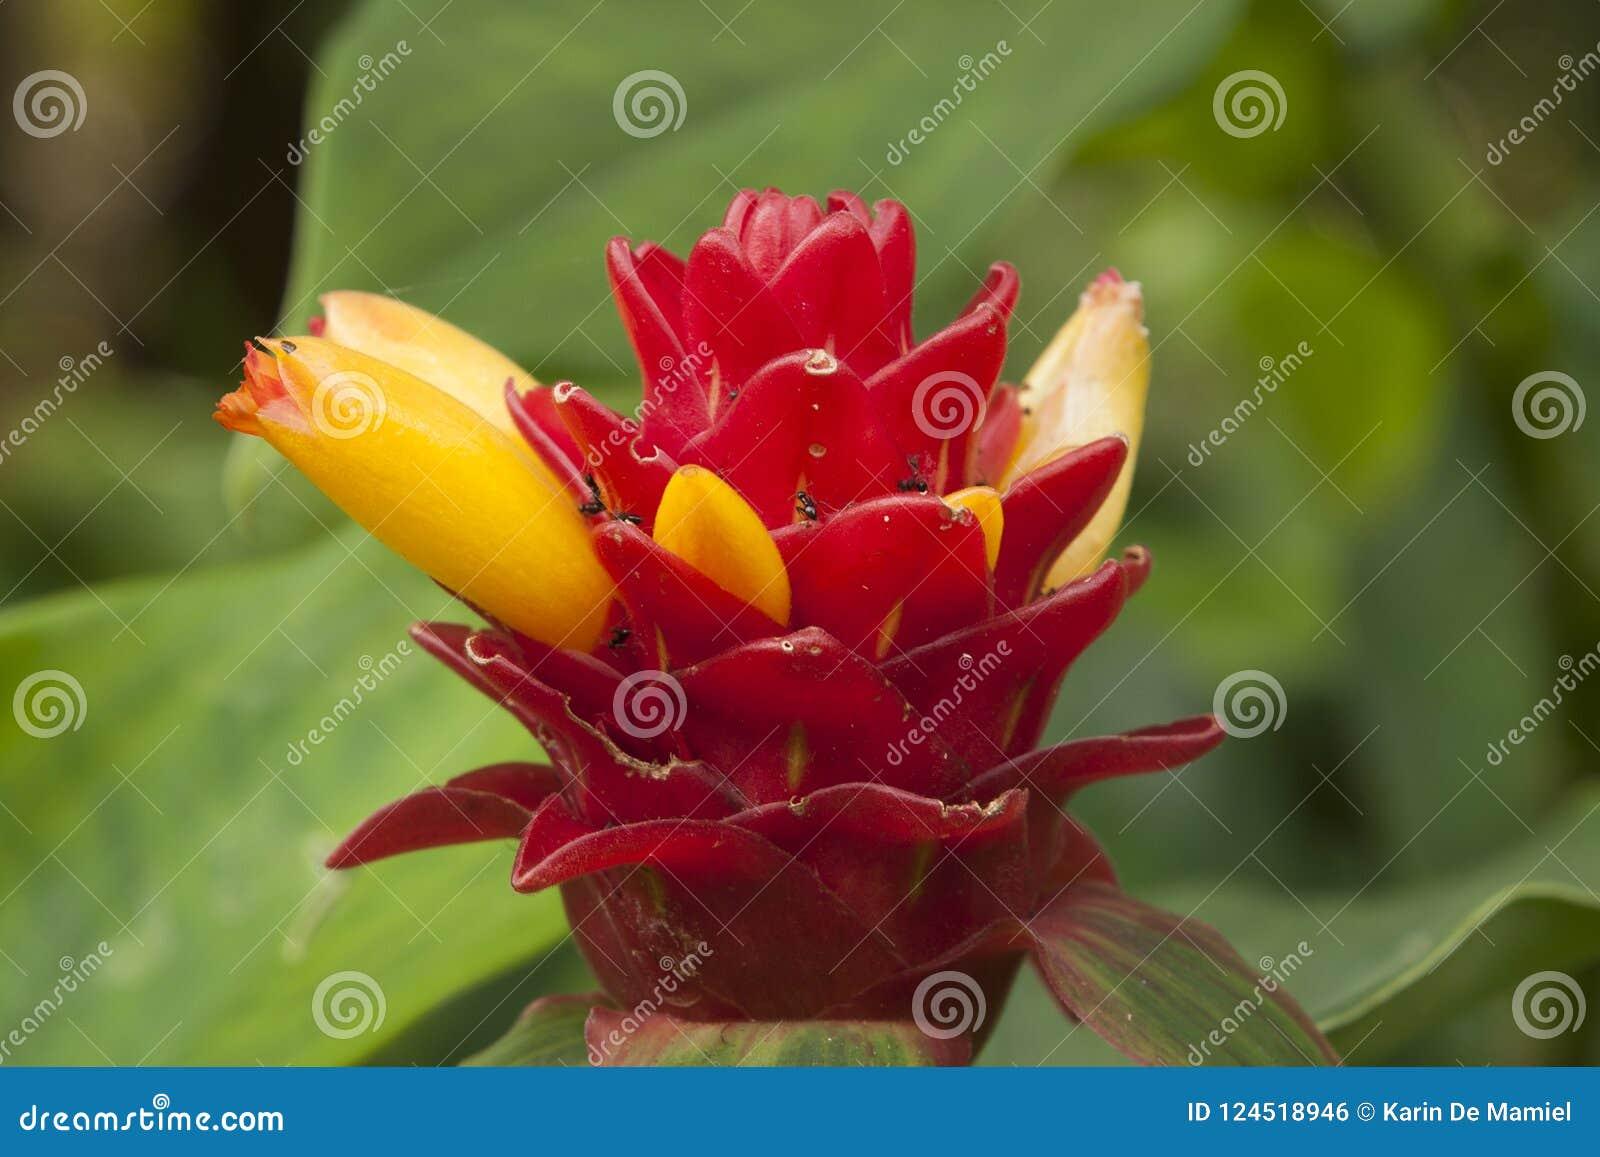 Costus barbatus with red inflorescence and bright yellow tubular autumn in the garden sydney australia mightylinksfo